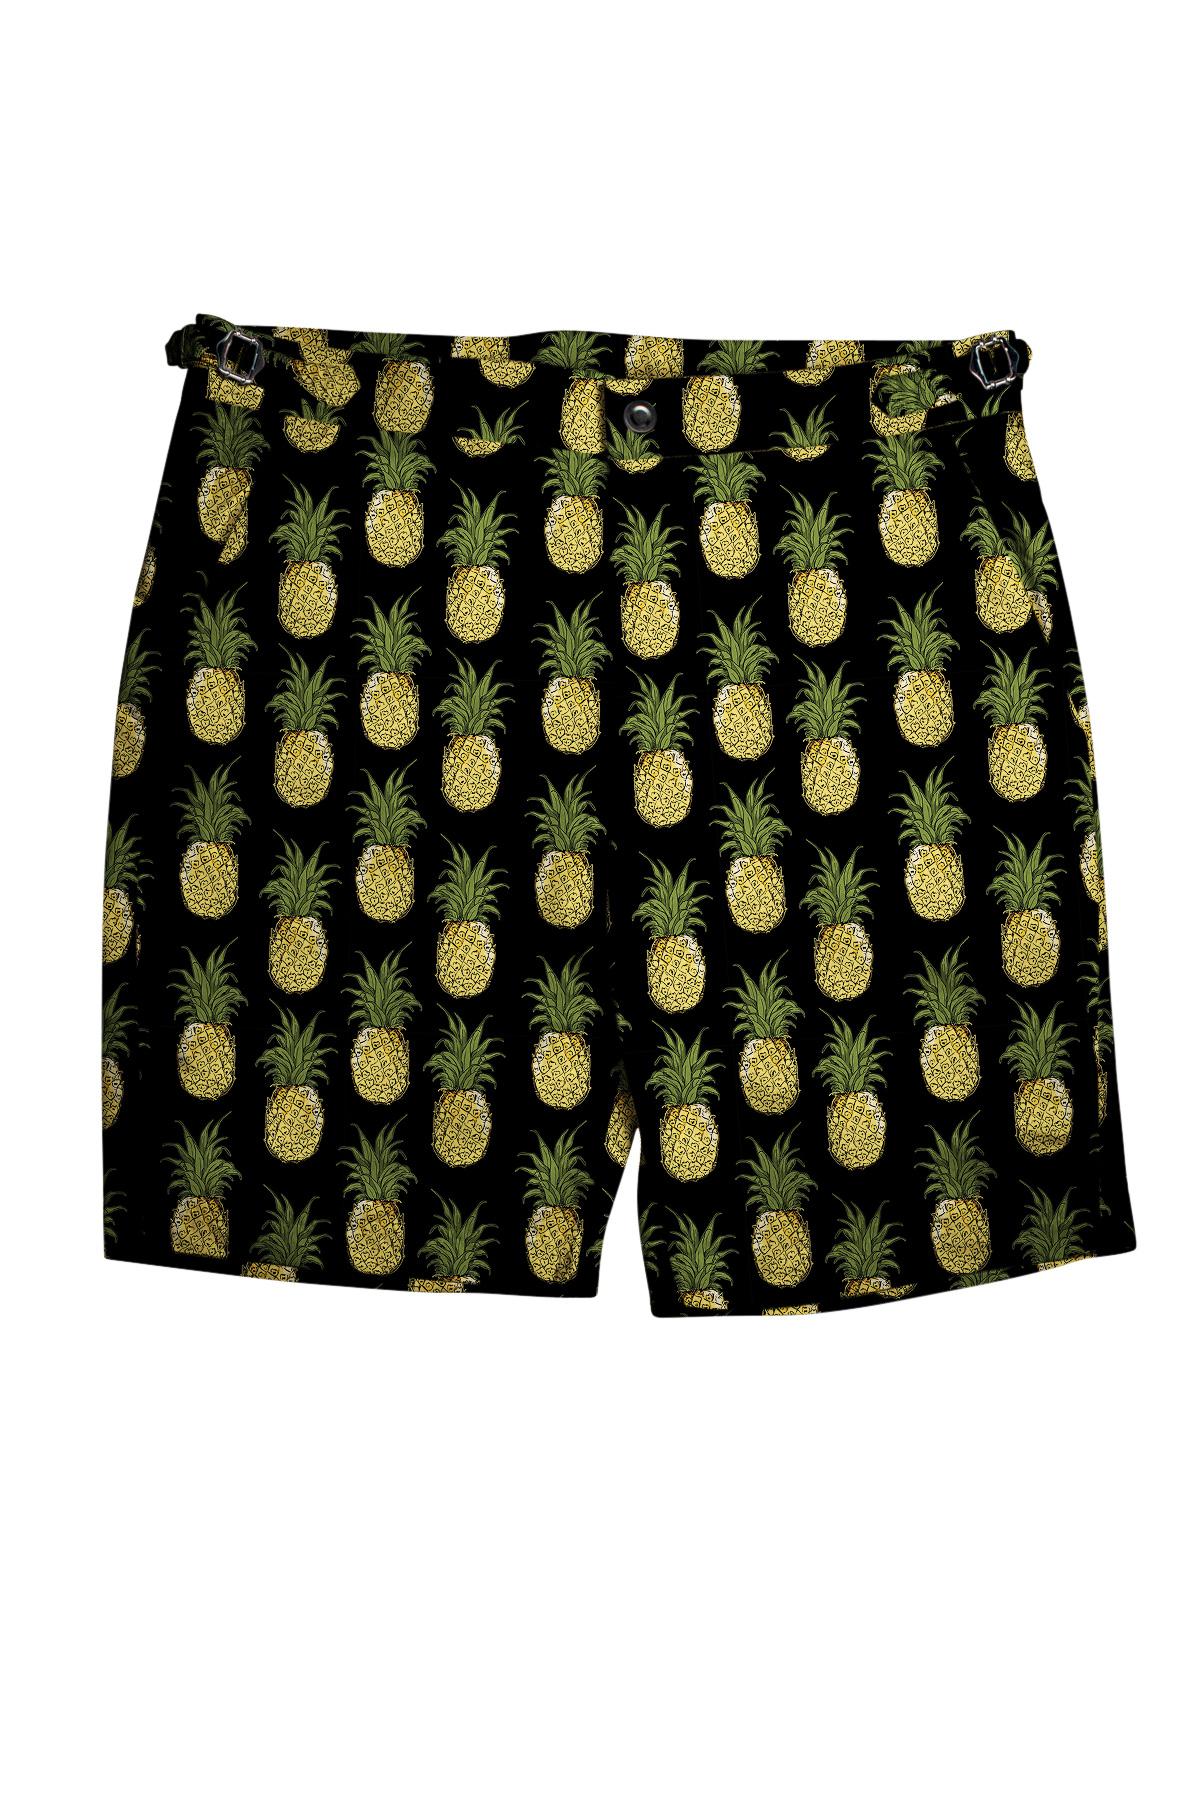 Black with Yellow Pineapples Swim Shorts